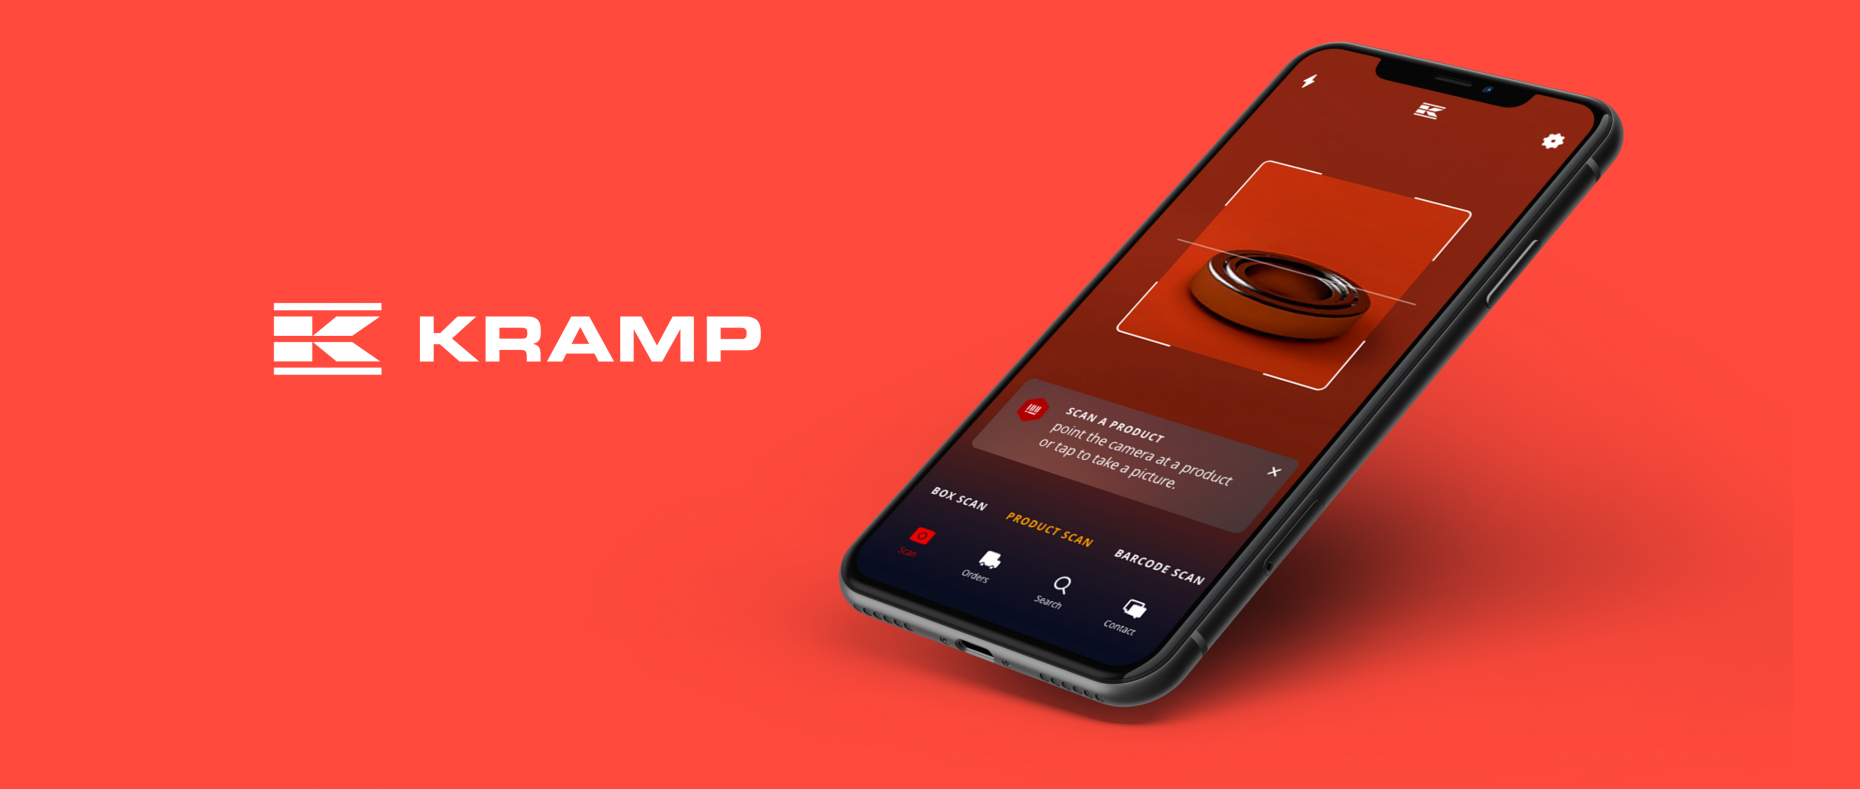 Kramp UX design app